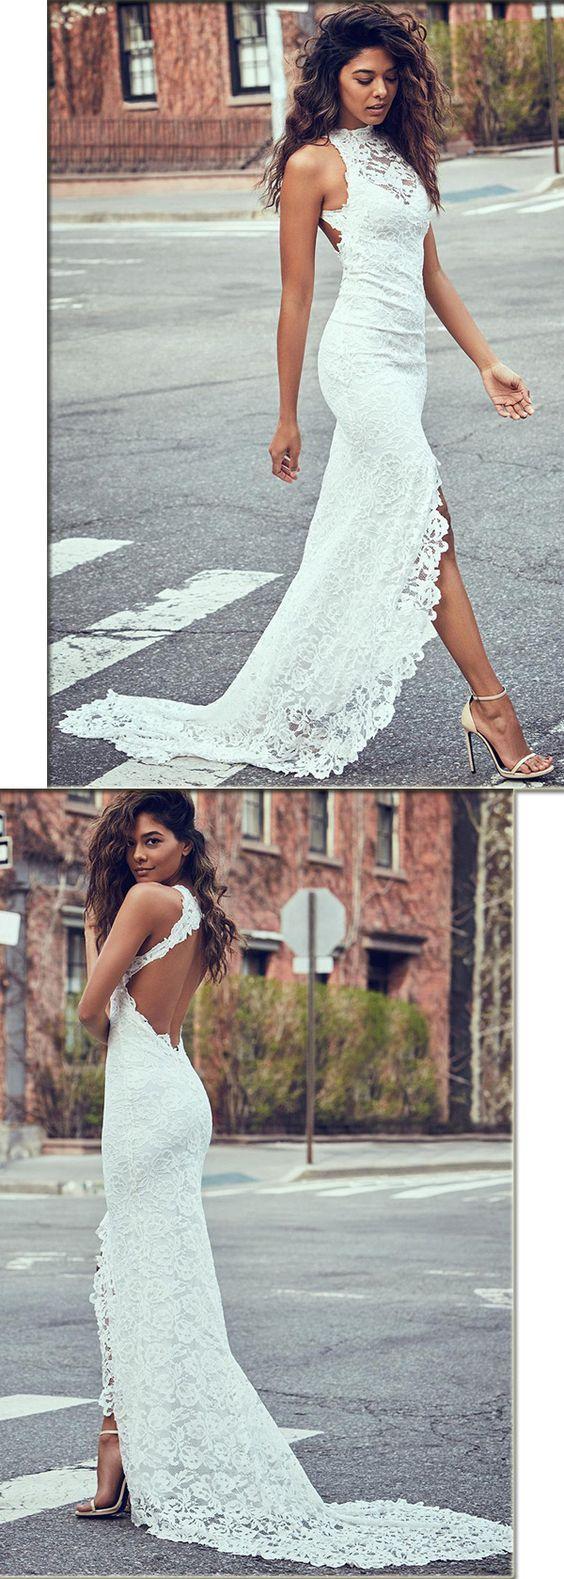 Lace wedding dress halter  Charming Lace Halter Neckline Sheath Wedding Dresses With Slit